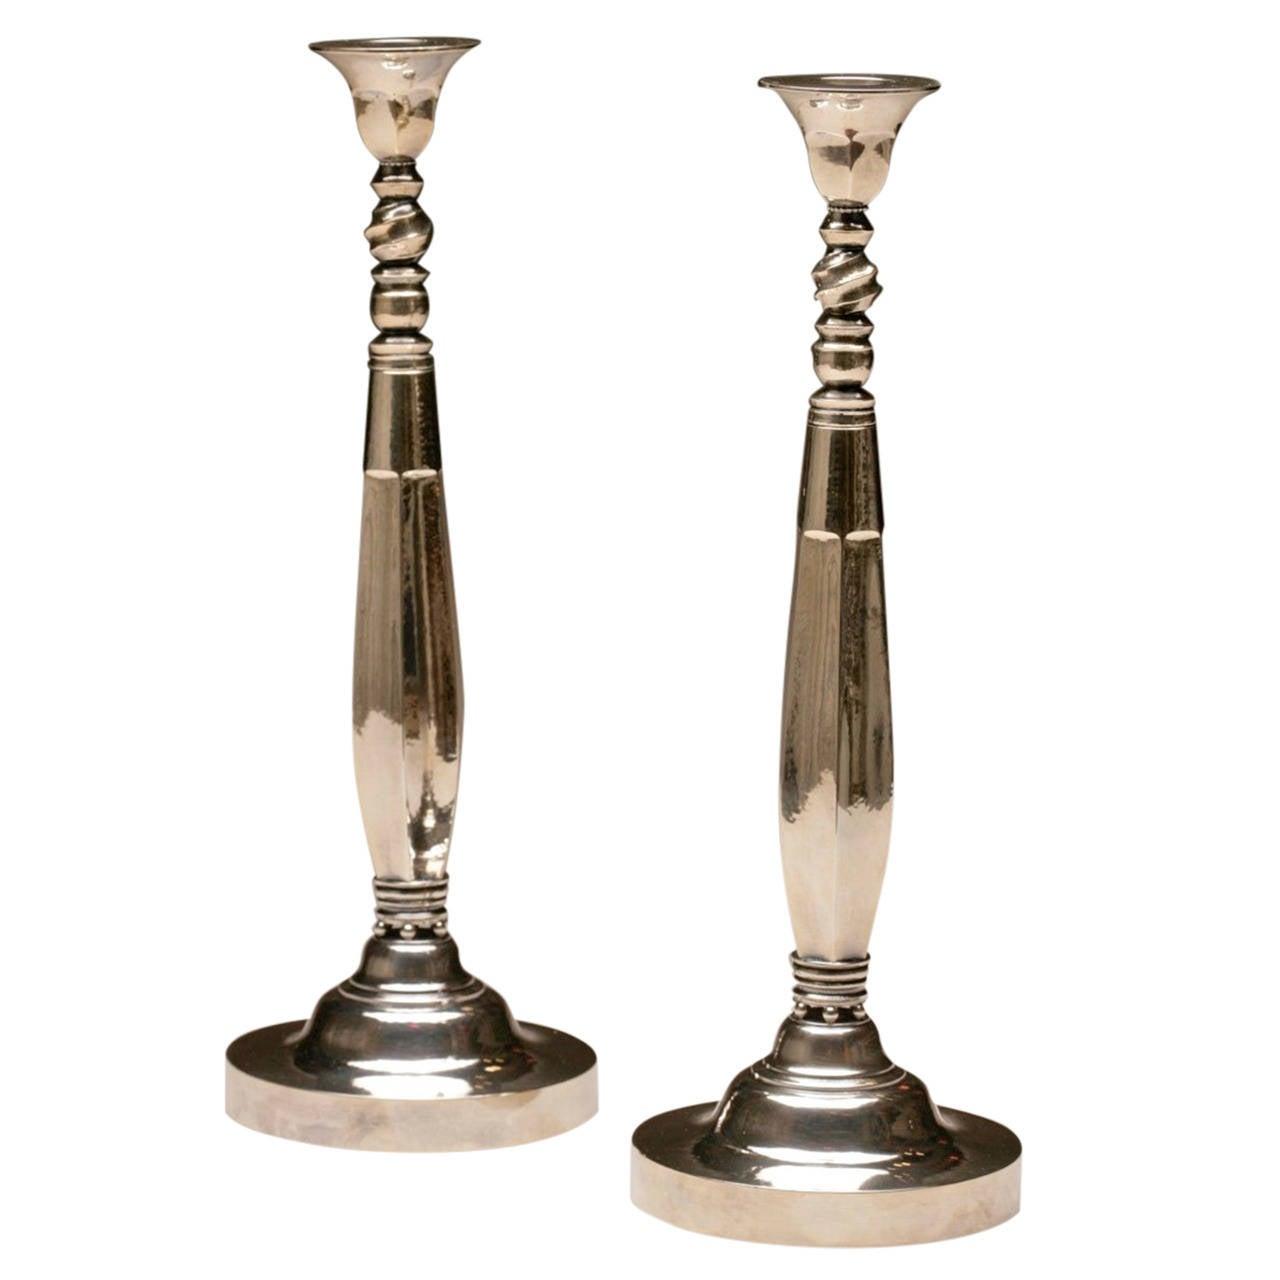 georg jensen candlesticks no 441 by johan rohde at 1stdibs. Black Bedroom Furniture Sets. Home Design Ideas